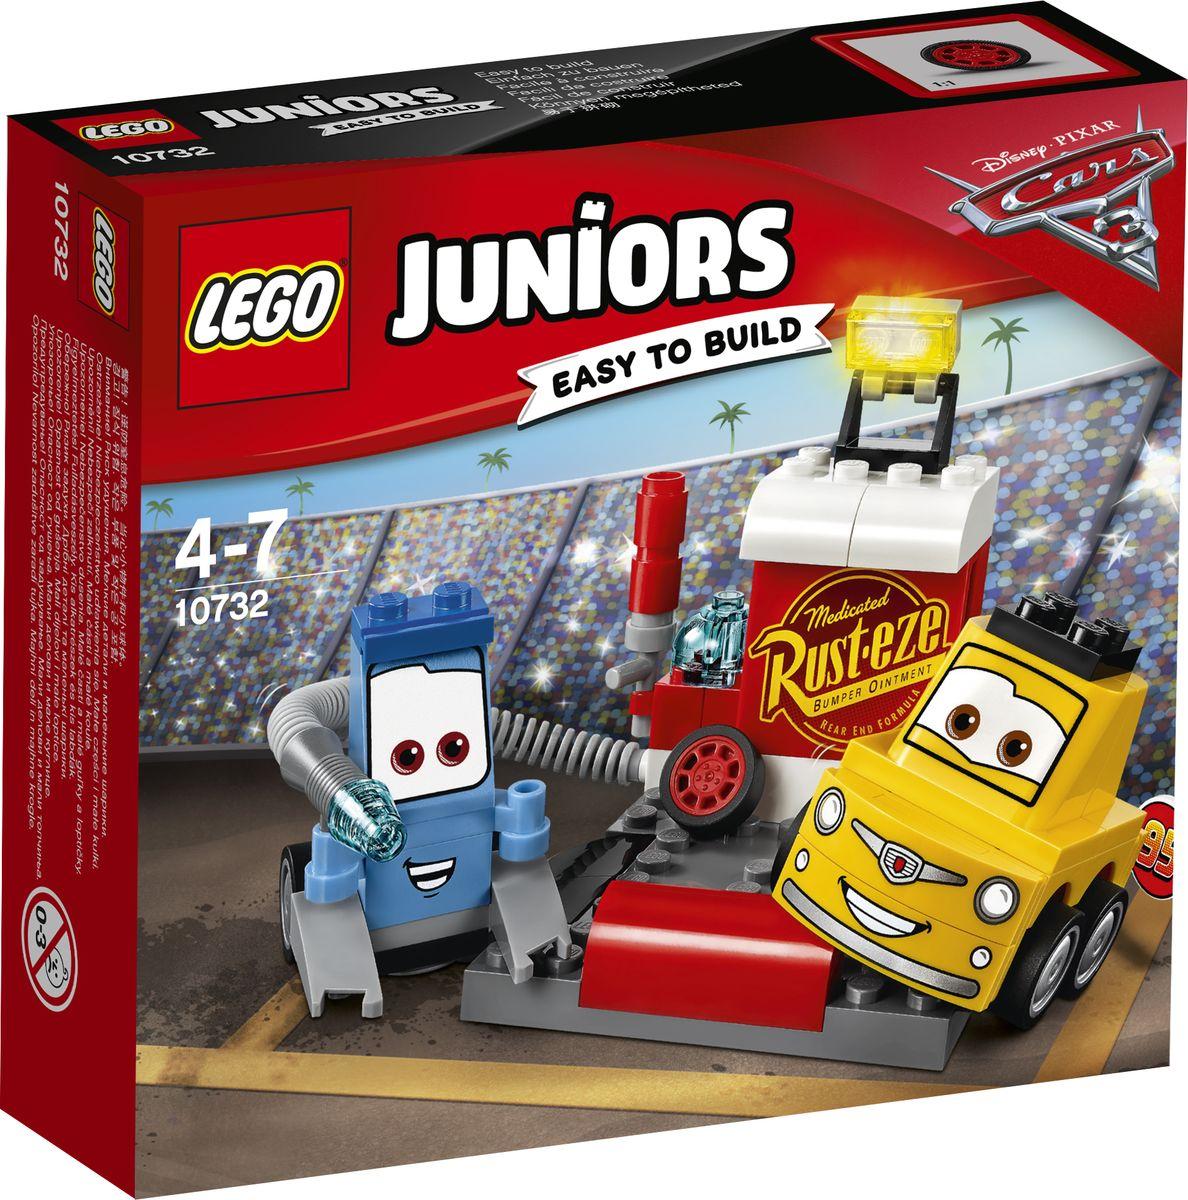 LEGO Juniors Конструктор Пит-стоп Гвидо и Луиджи 10732 lego juniors конструктор финальная гонка флорида 500 10745